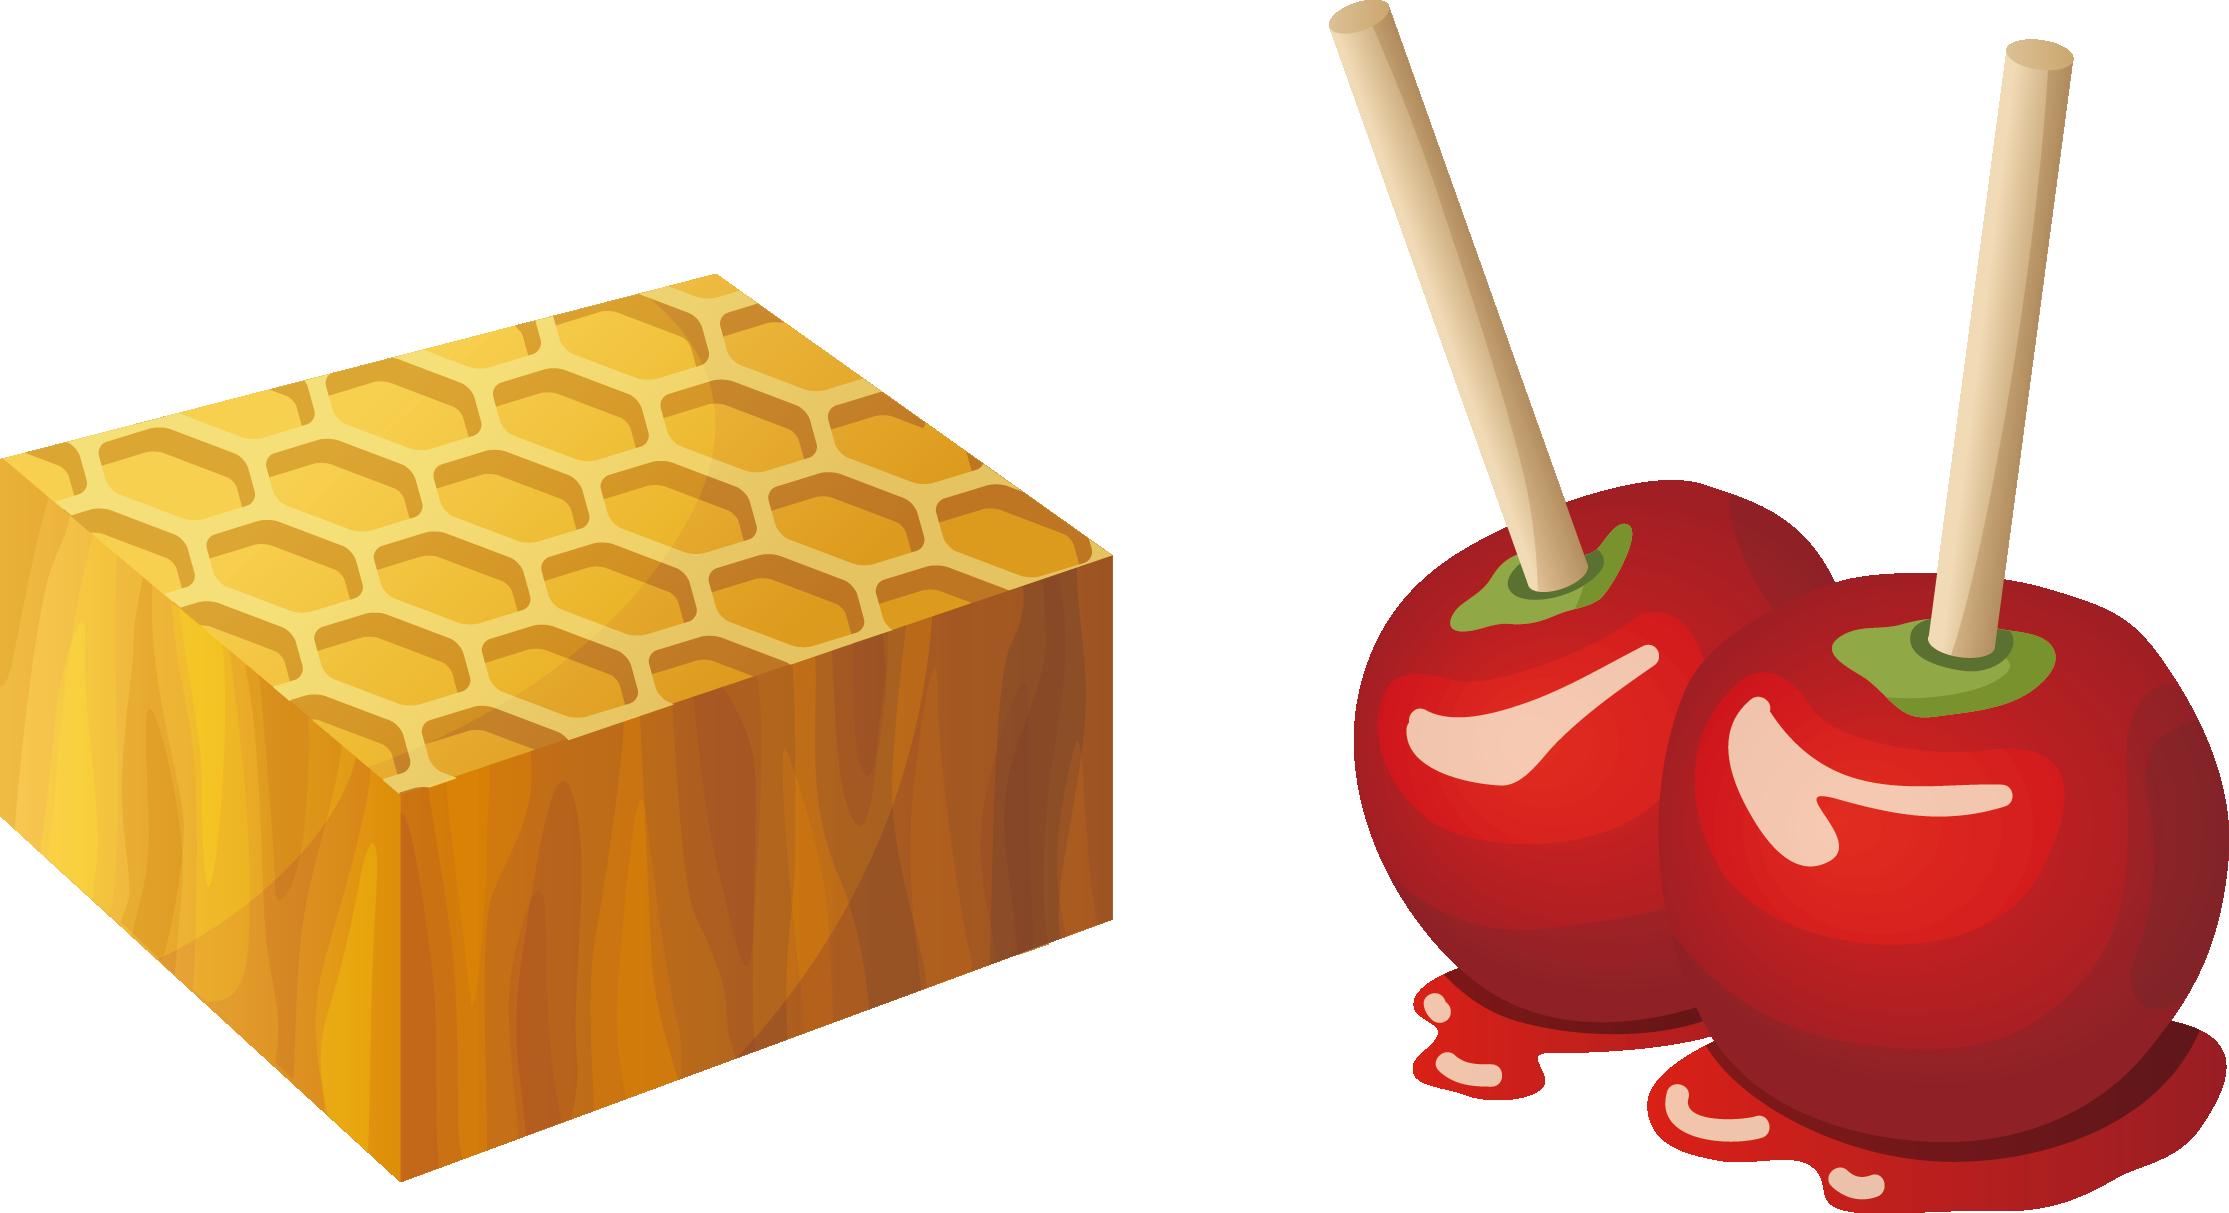 2229x1213 Candy Apple Caramel Apple Fruit Salad Clip Art